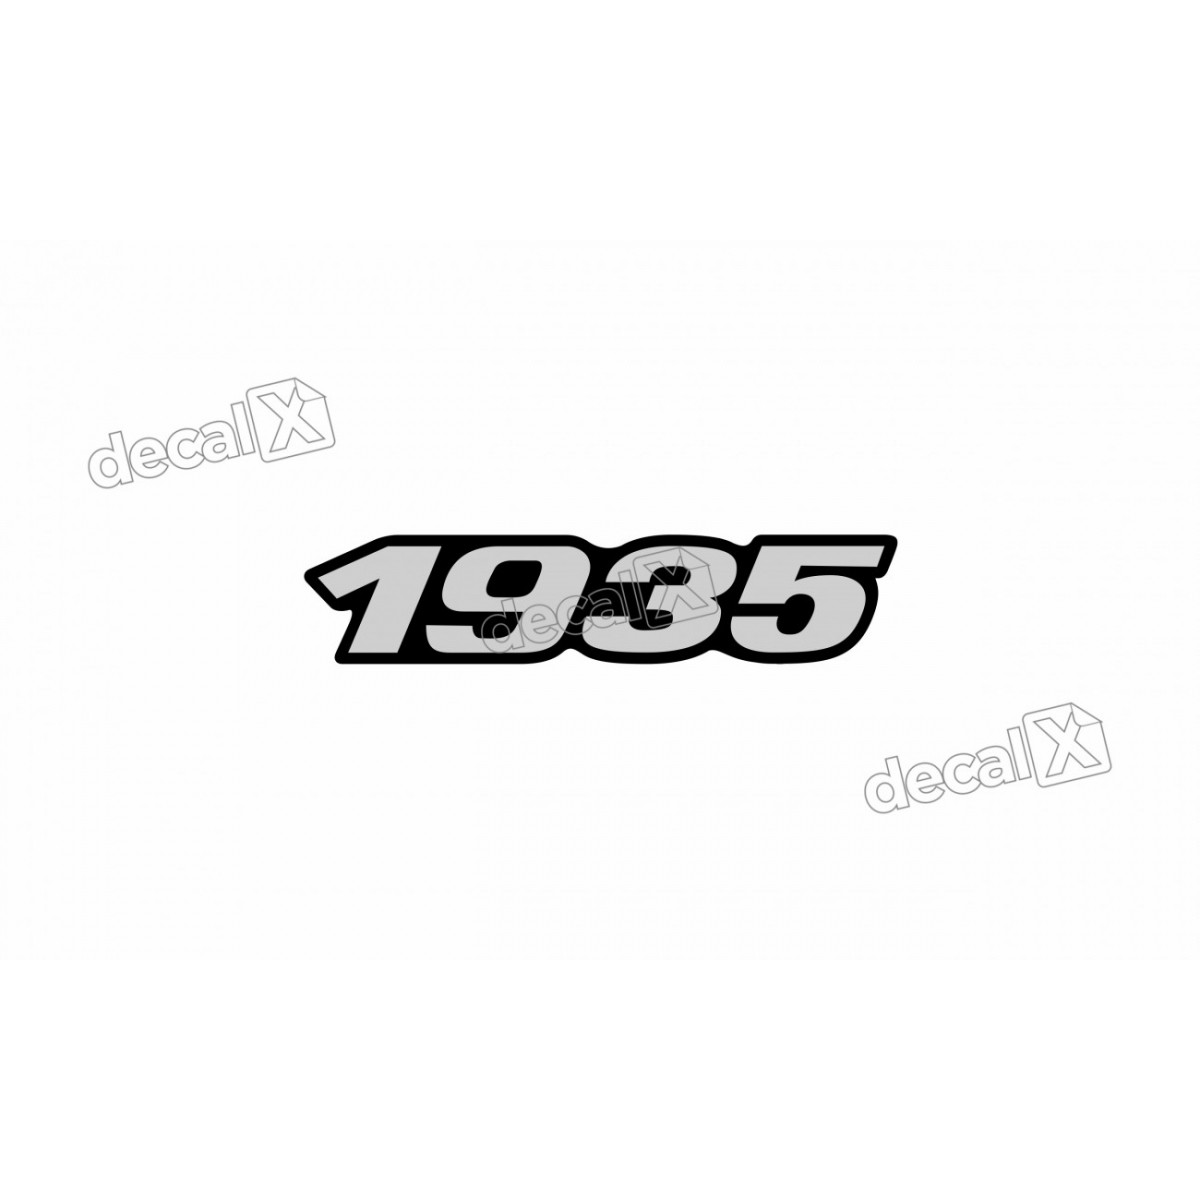 Adesivo Emblema Resinado Mercedes 1935 Cm70 Decalx